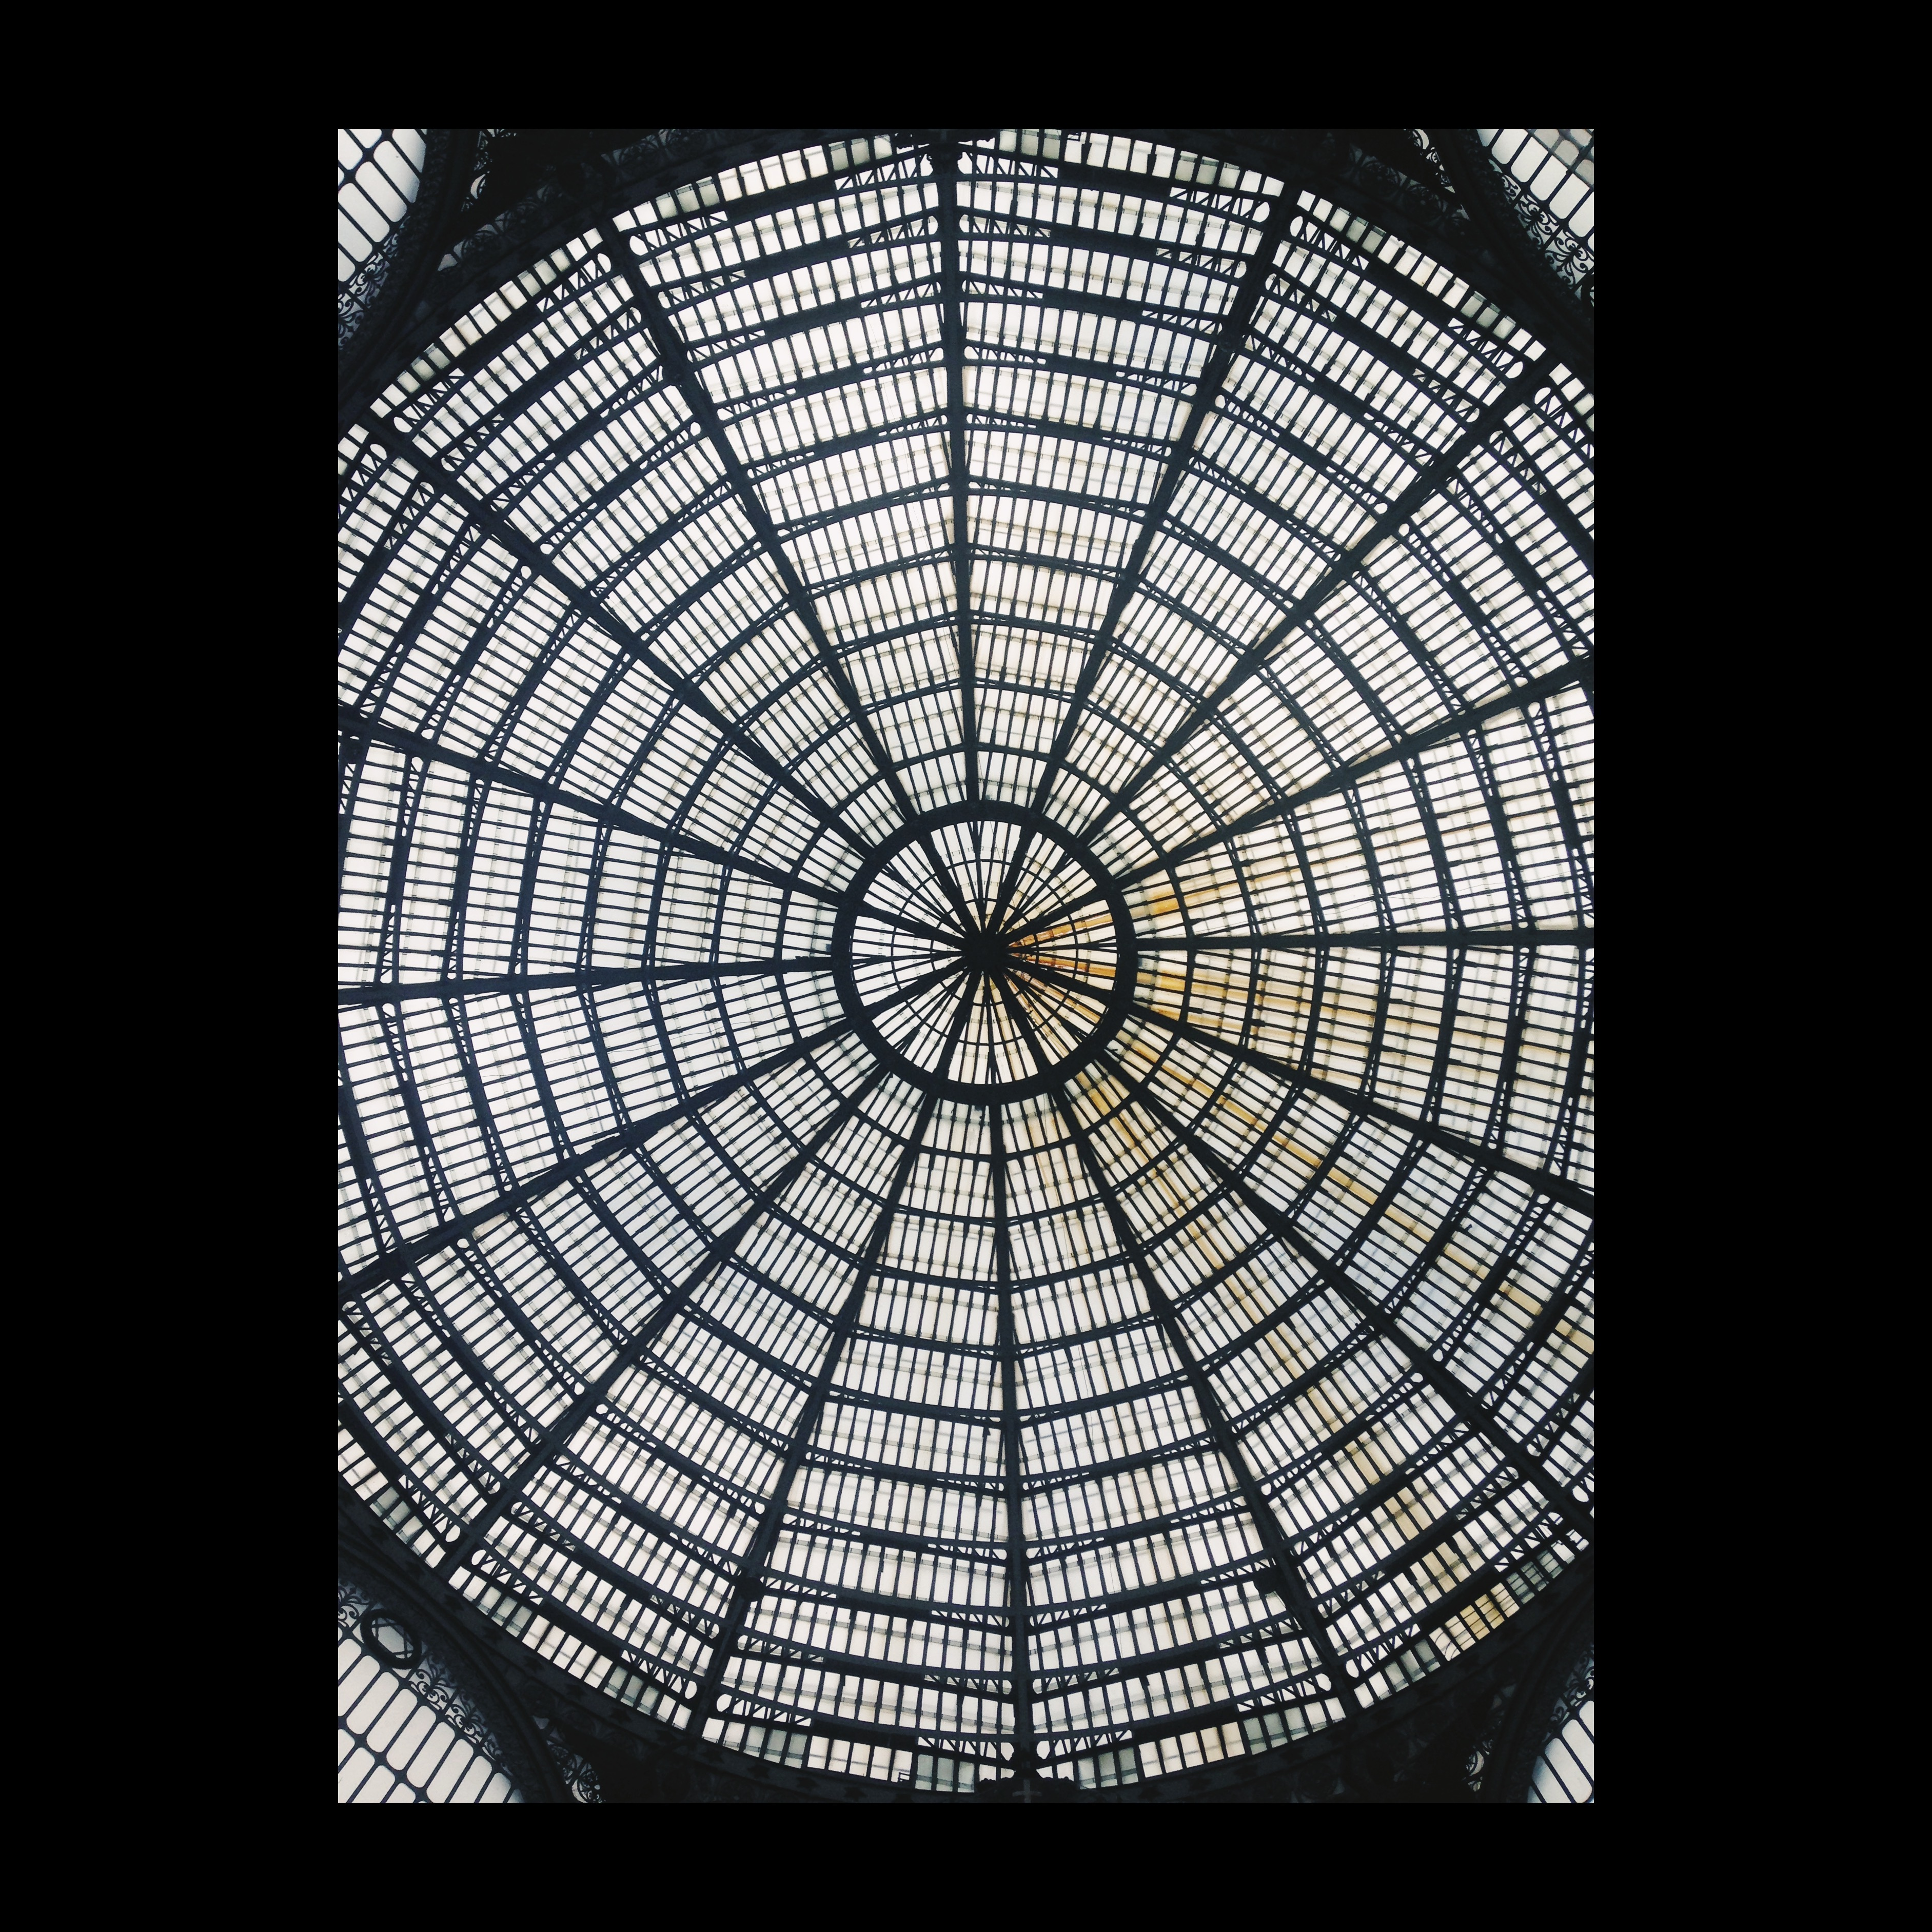 Galleria Umberto | Napoli